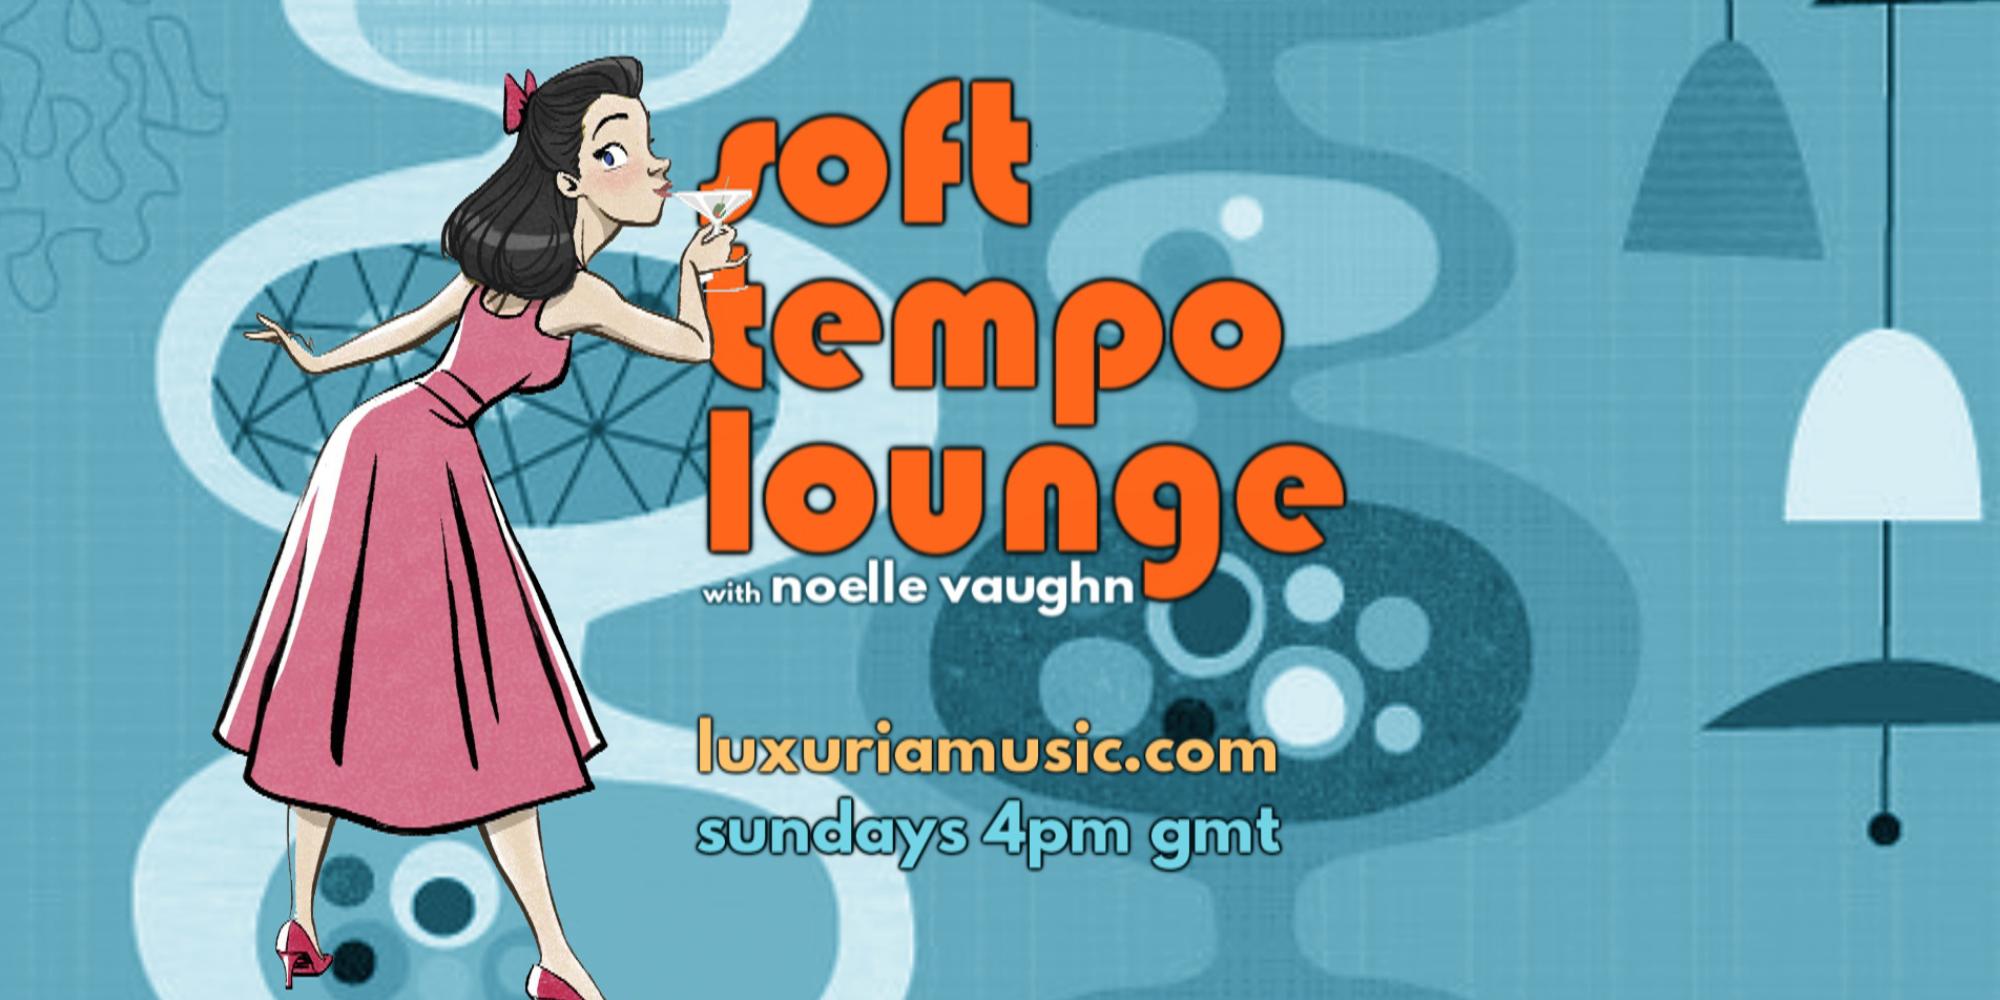 Soft Tempo Lounge Premiers 10.31.2021